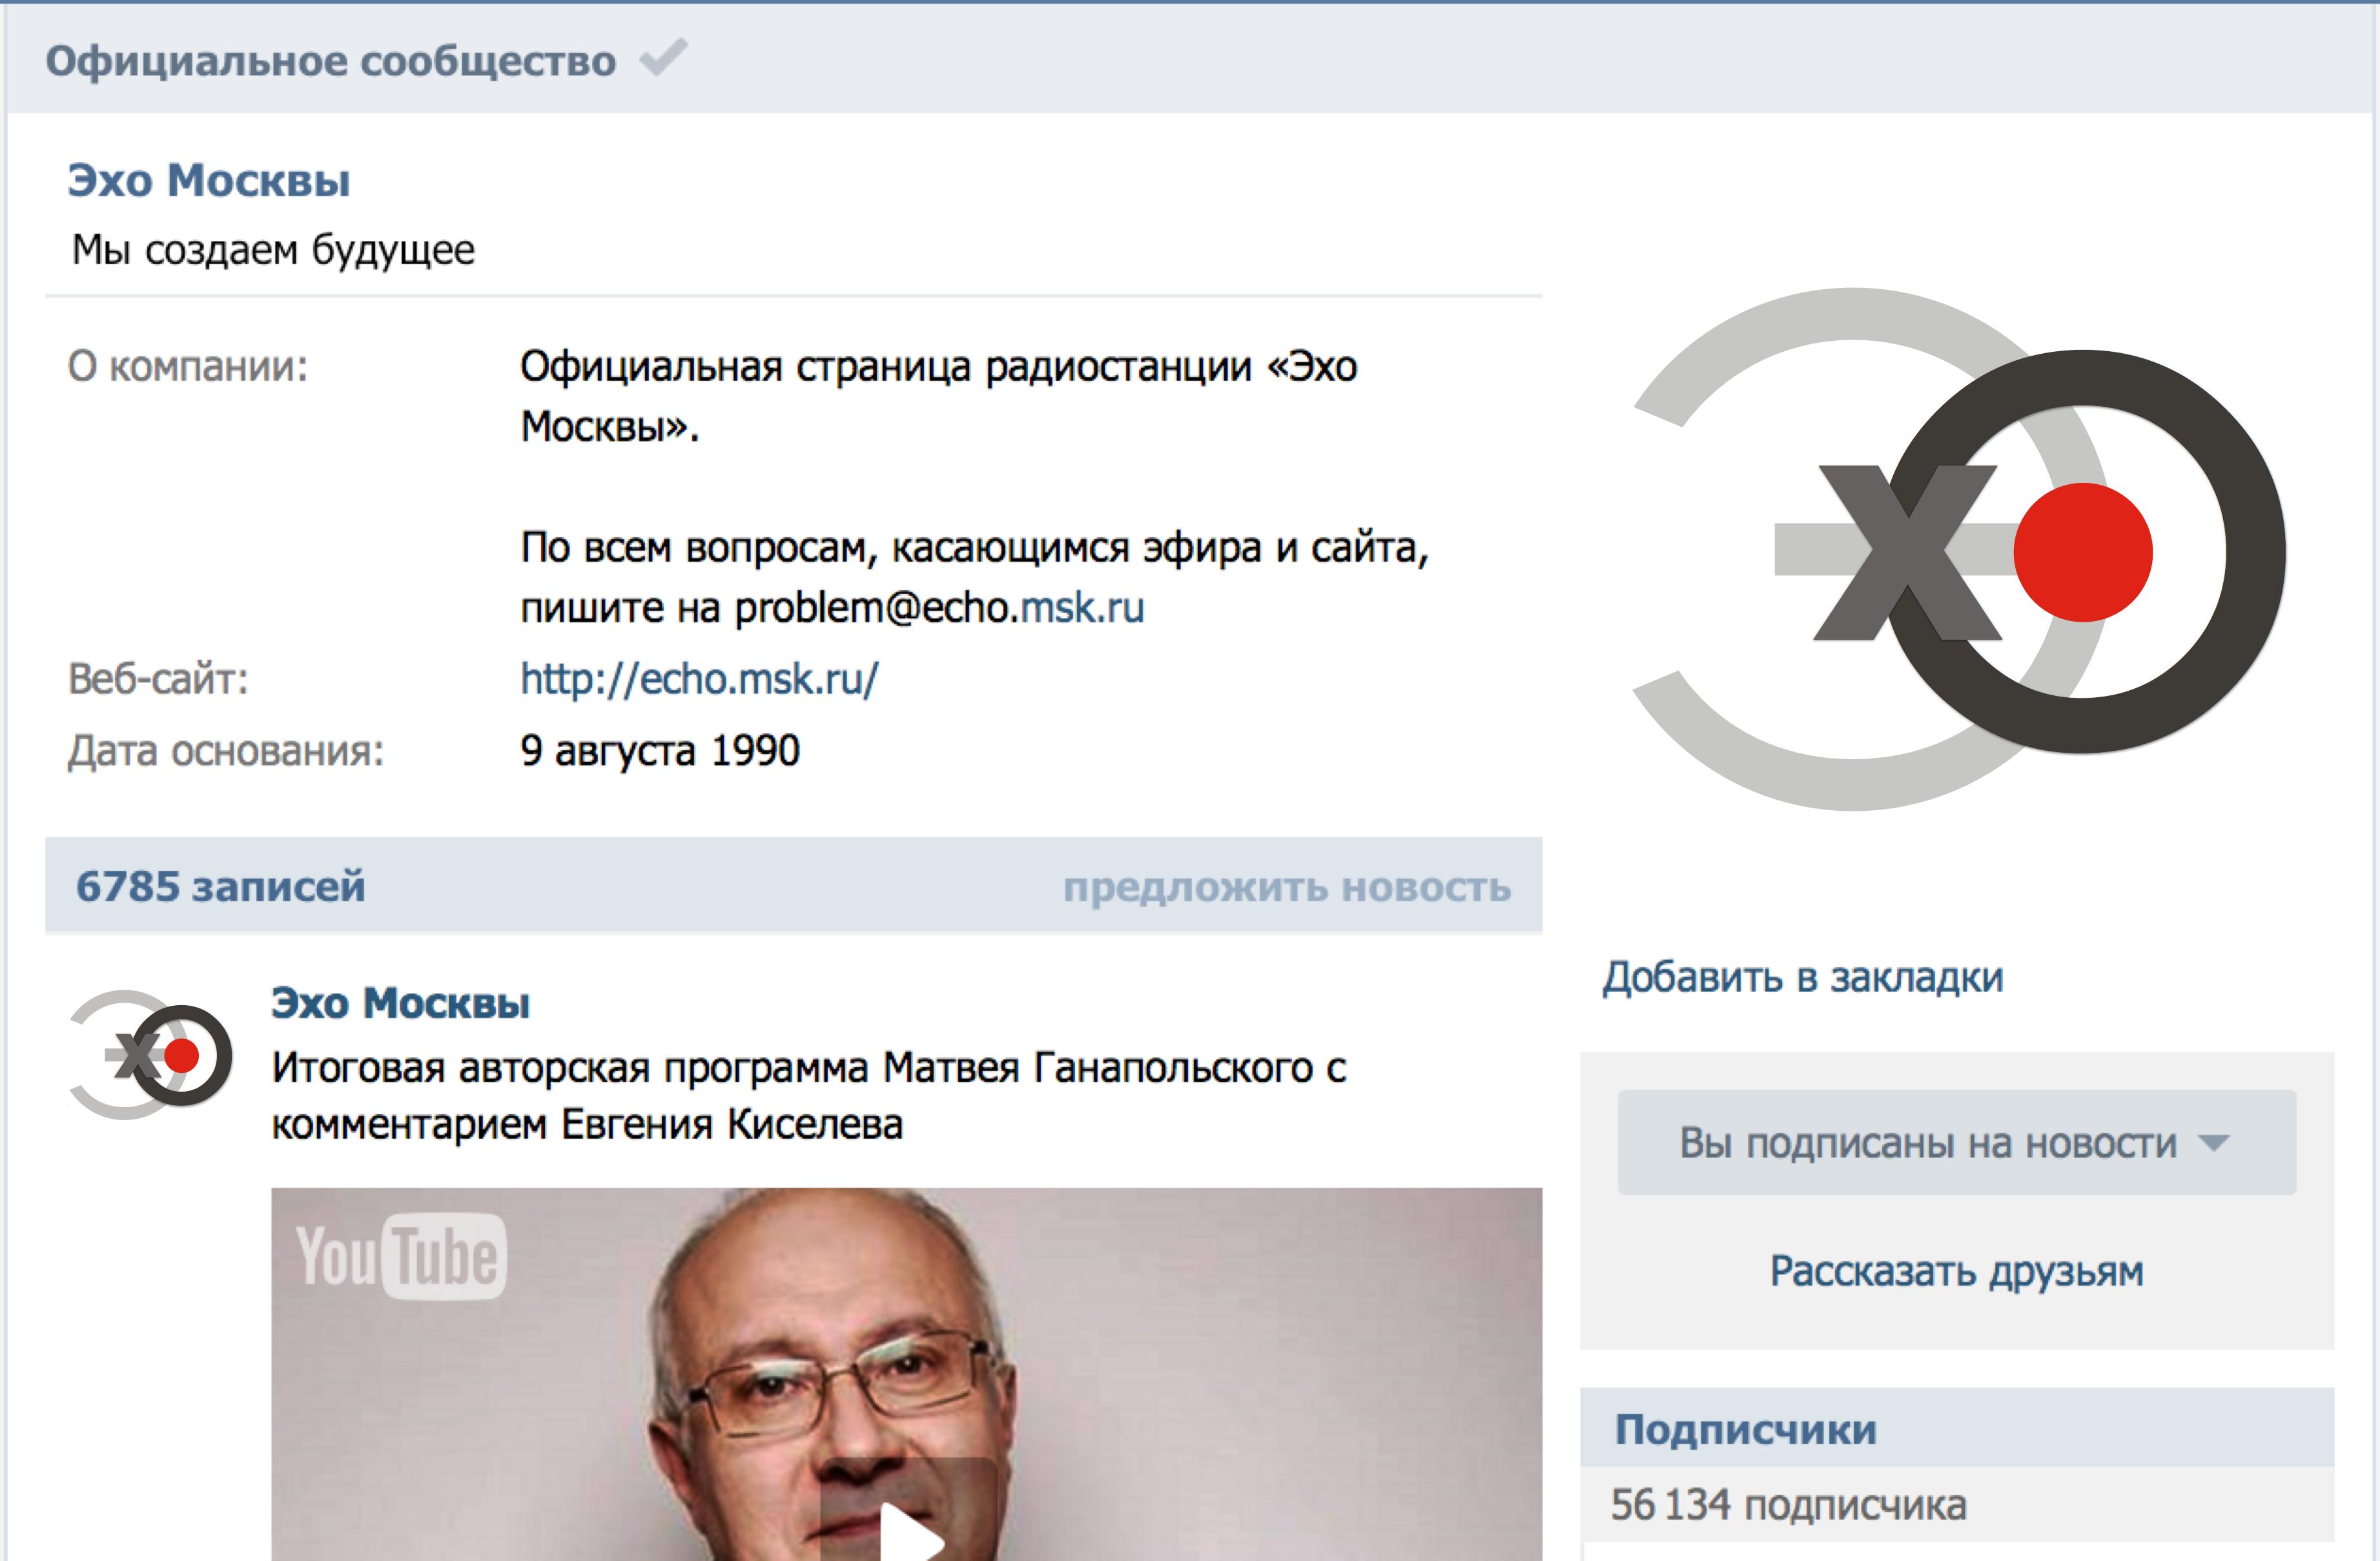 Дизайн логотипа р/с Эхо Москвы. фото f_1715624c71d22703.png